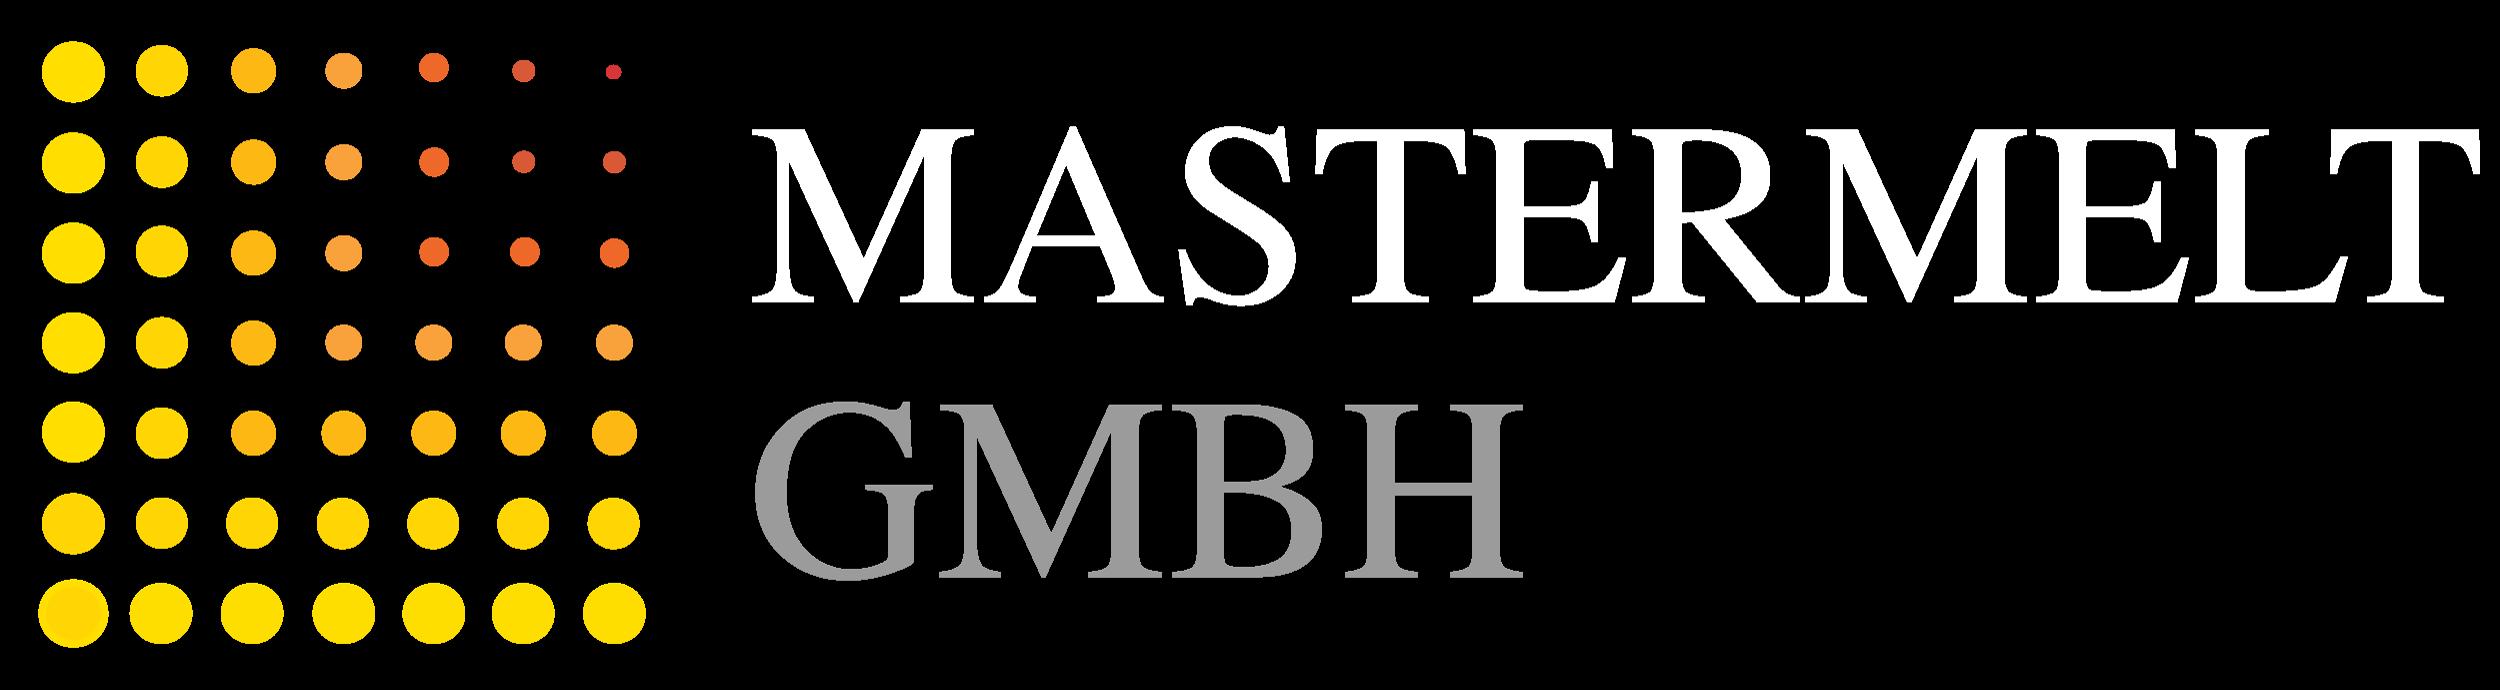 Mastermelt GmbH